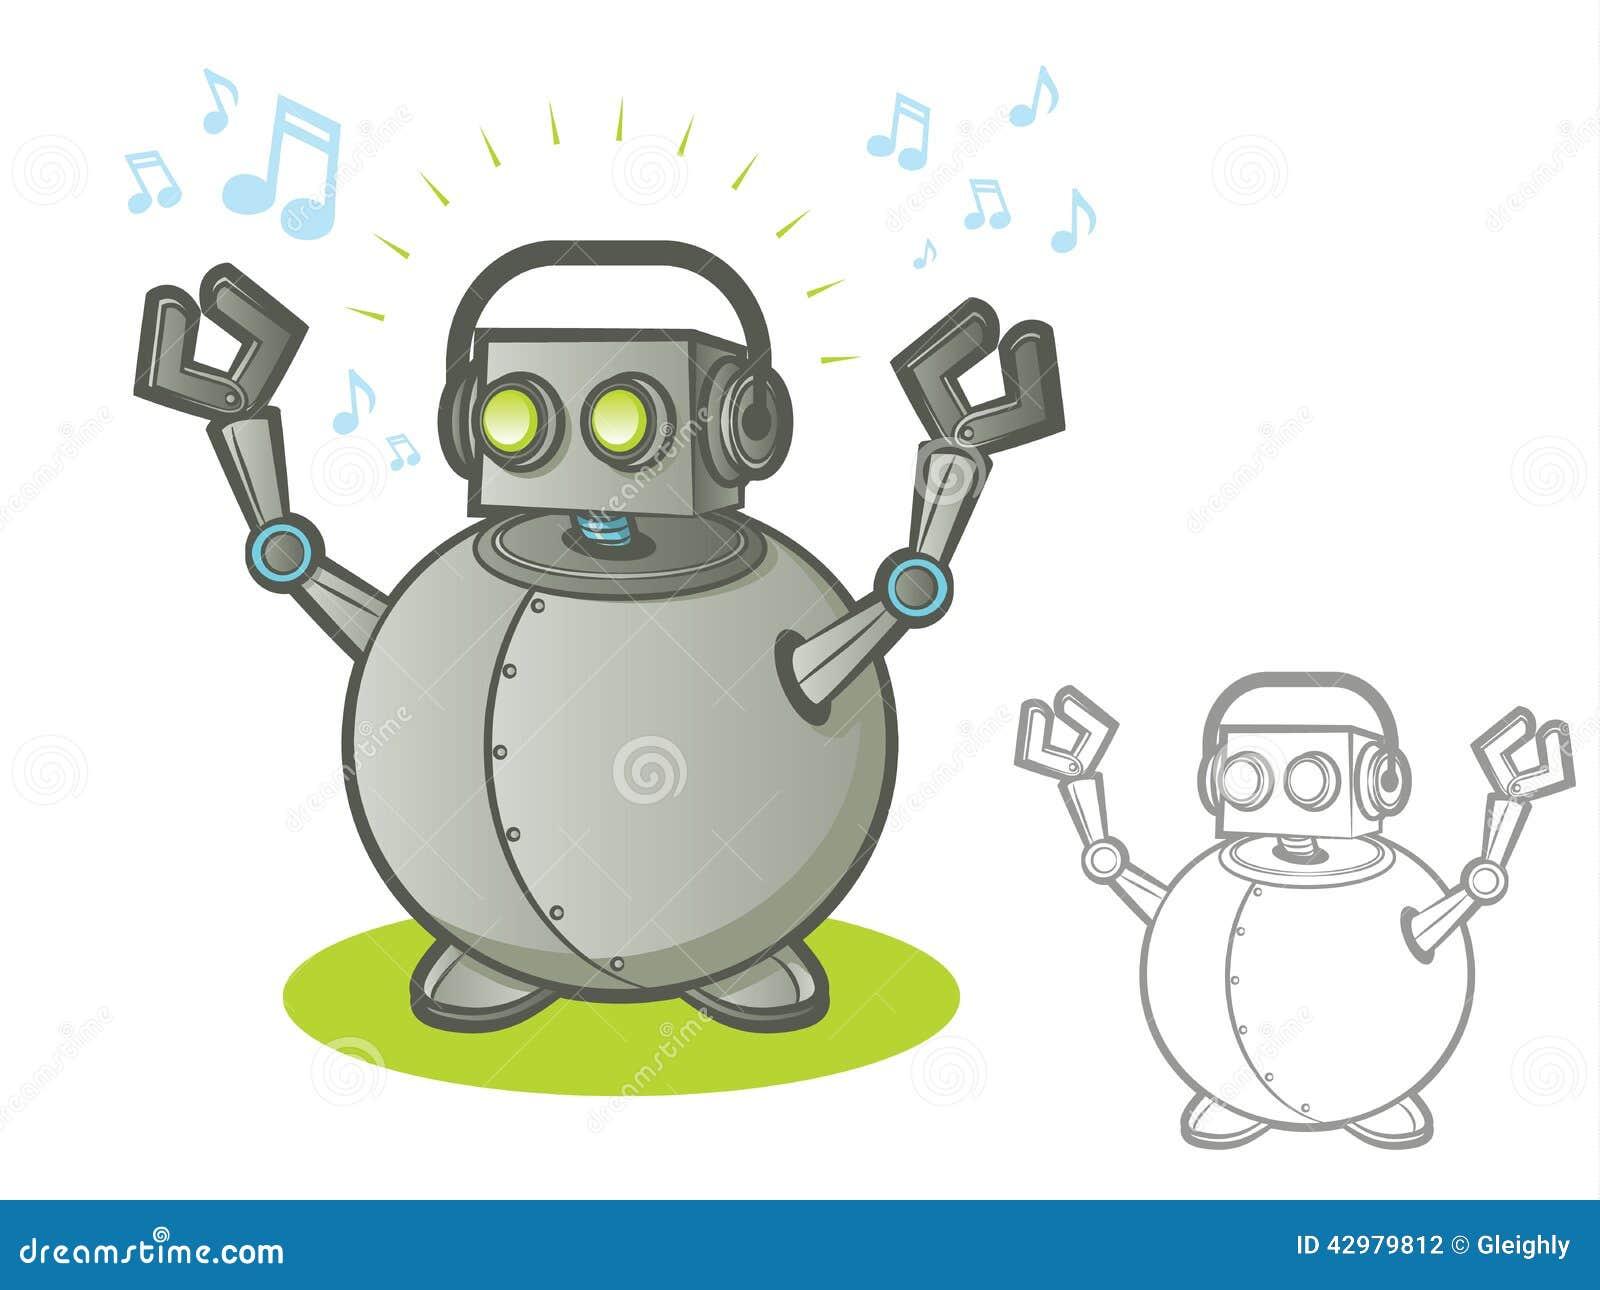 download 有耳机的机器人 向量例证.图片